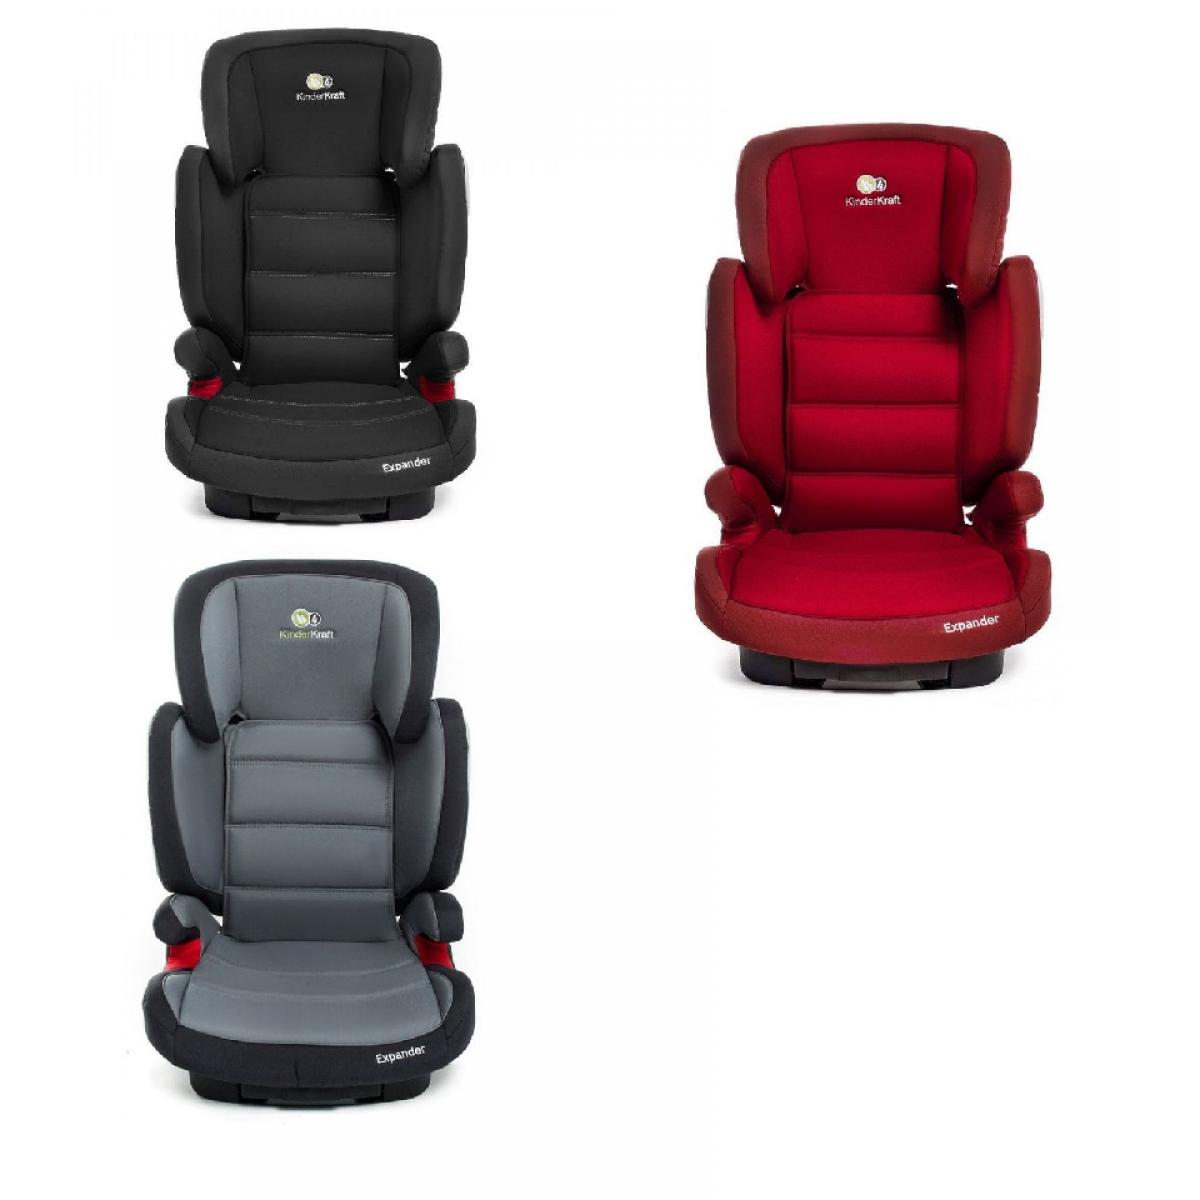 kinderkraft autositz junior plus 15 36 kg. Black Bedroom Furniture Sets. Home Design Ideas